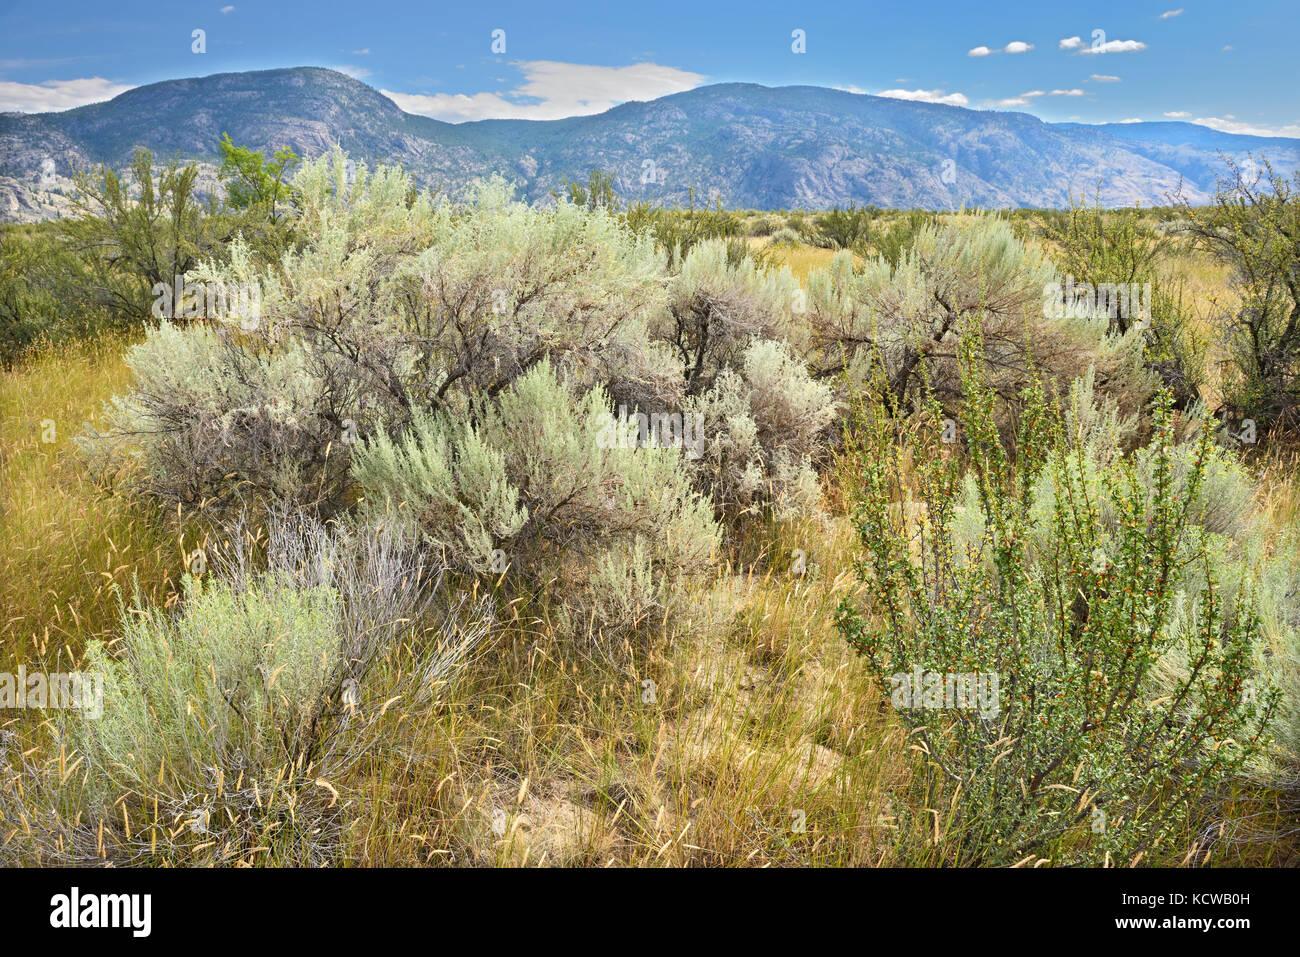 Sagebrush in Antelope-brush ecosystem. Okanagan Valley, Osoyoos, British Columbia, Canada - Stock Image